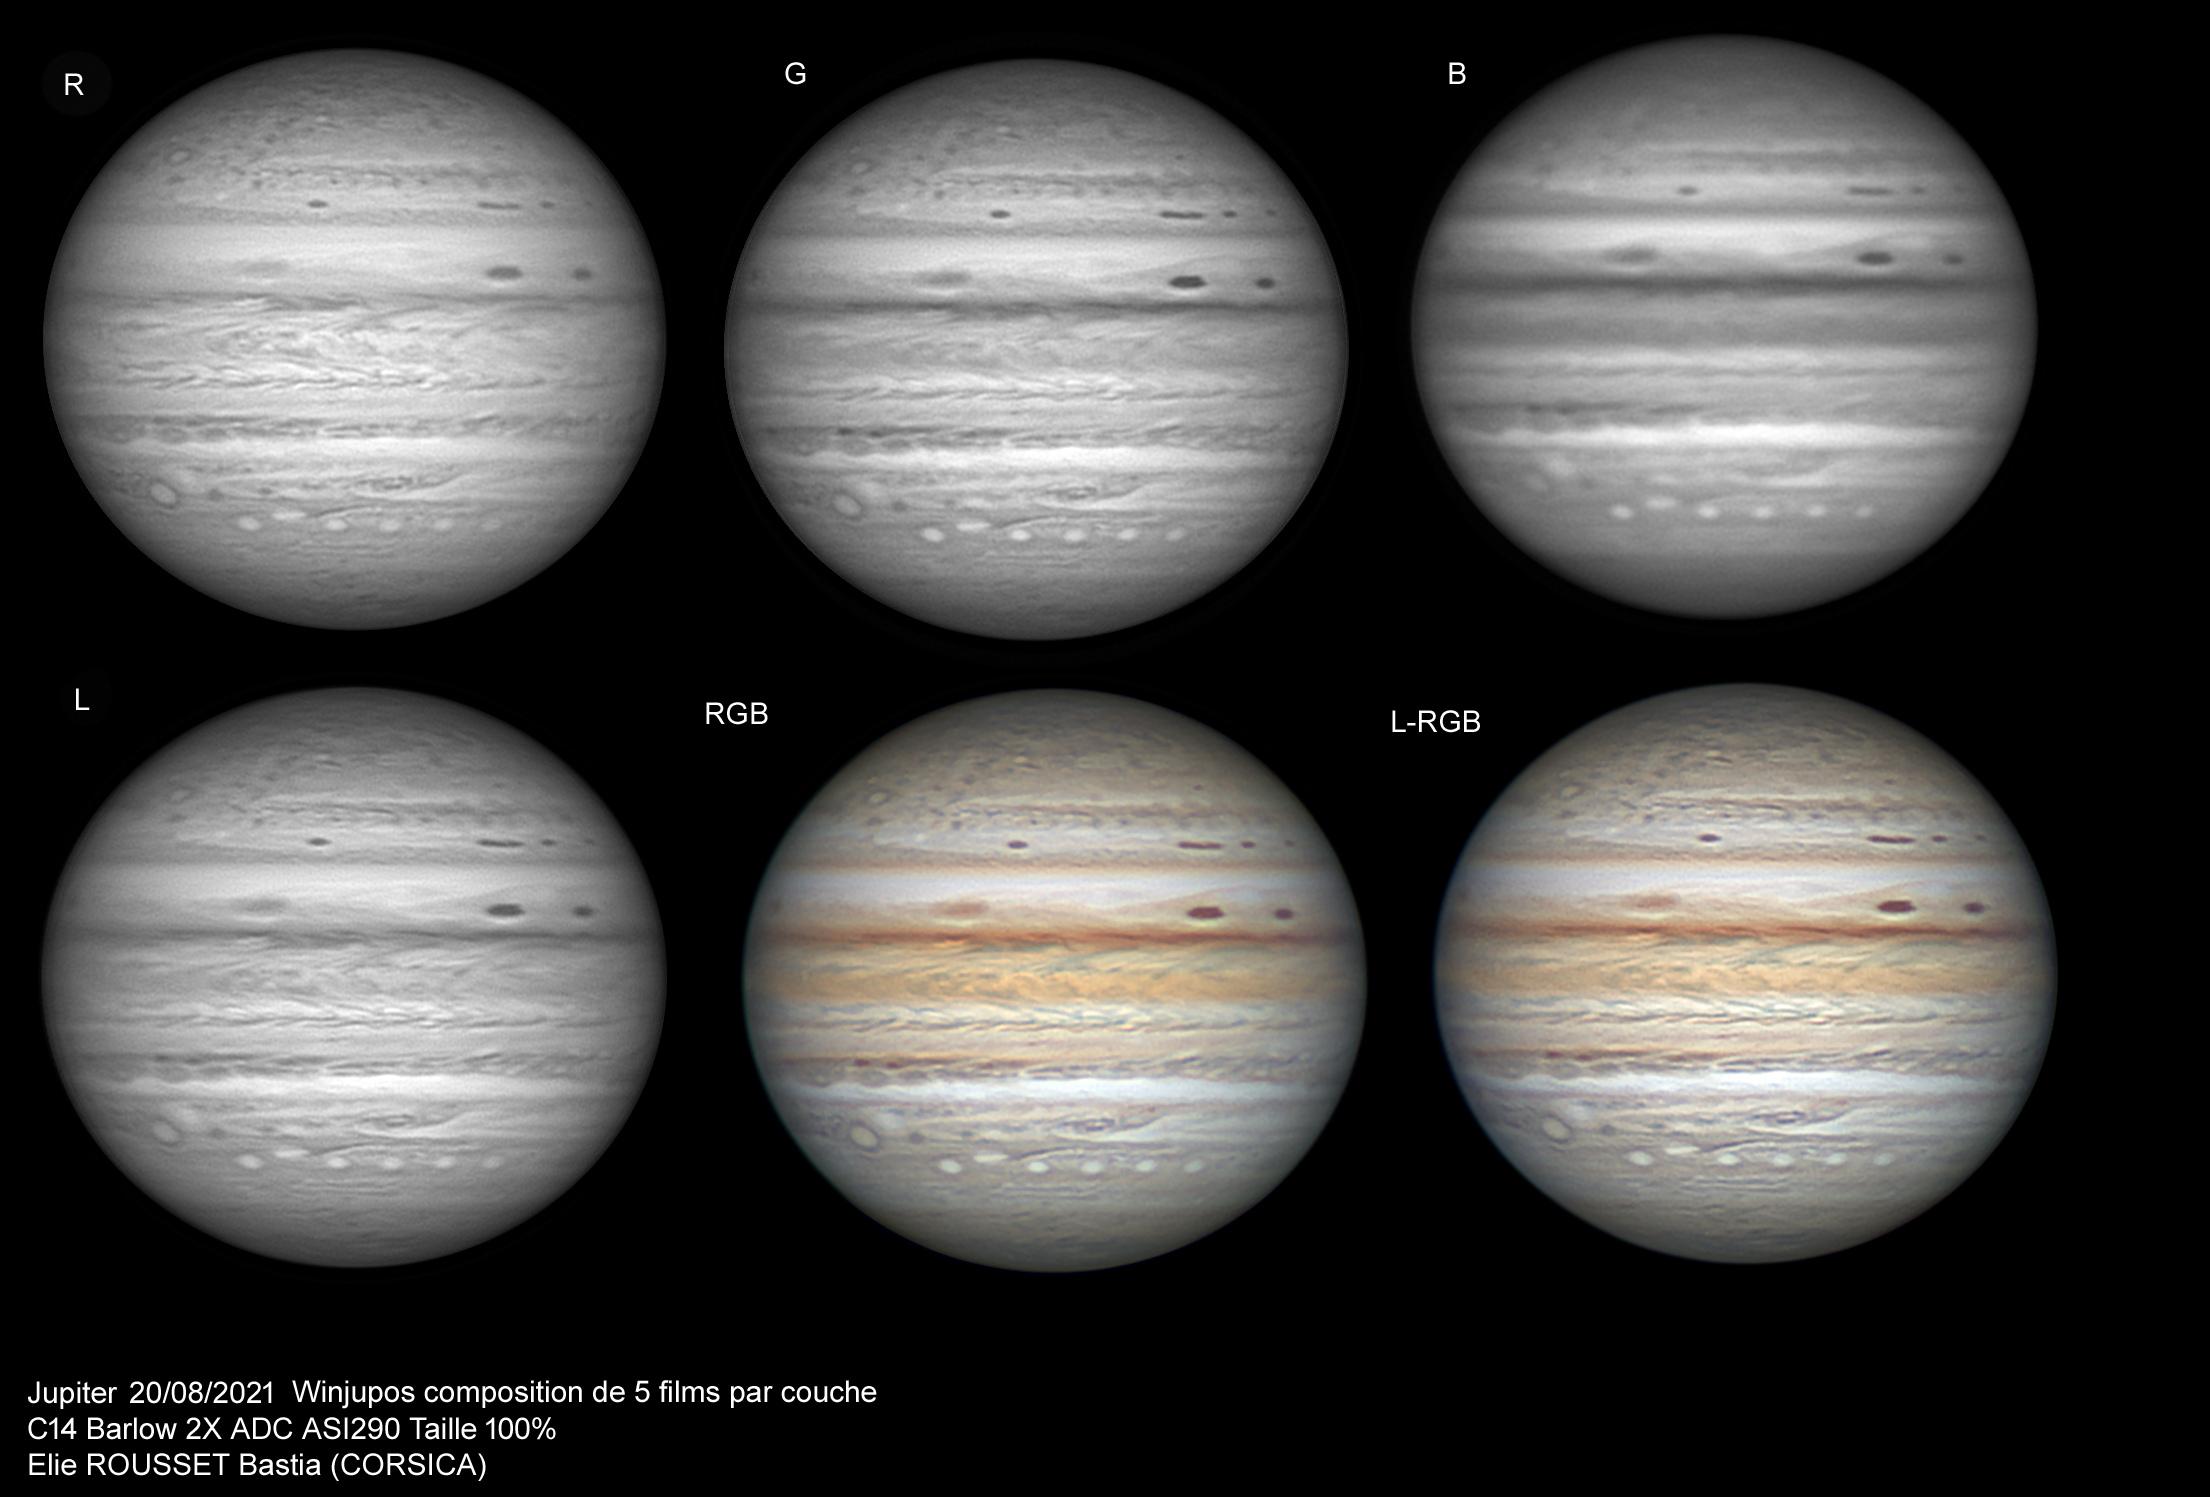 large.Jupiter-20-08-2021-Planche-.jpg.22a829716d37e46d700a0c5f196e5ed3.jpg